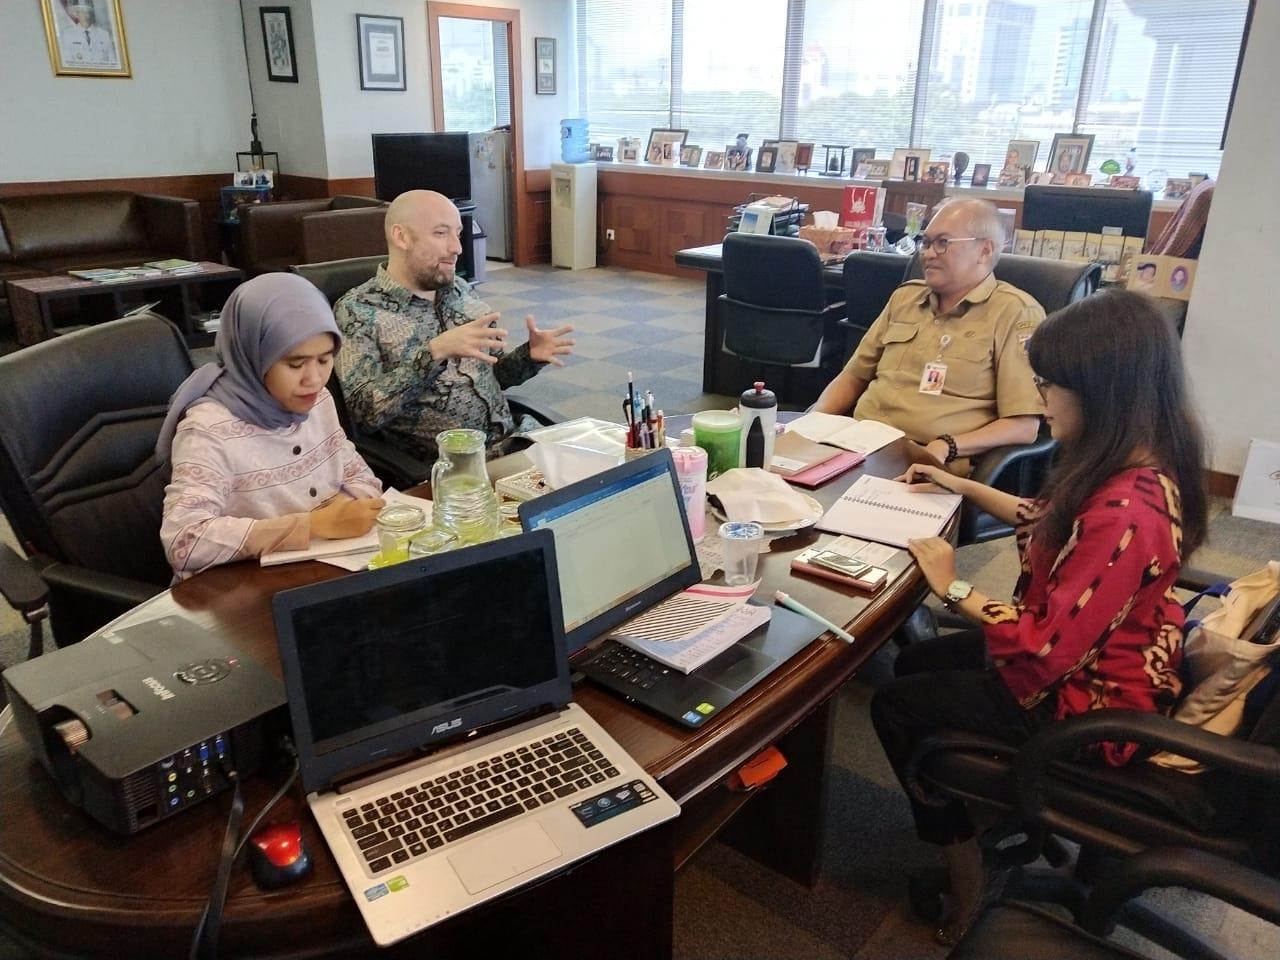 Photo of Pertemuan dengan Deputi Ekonomi dan Kemakmuran (Deputy Head of Economics and Prosperity) British Embassy Jakarta